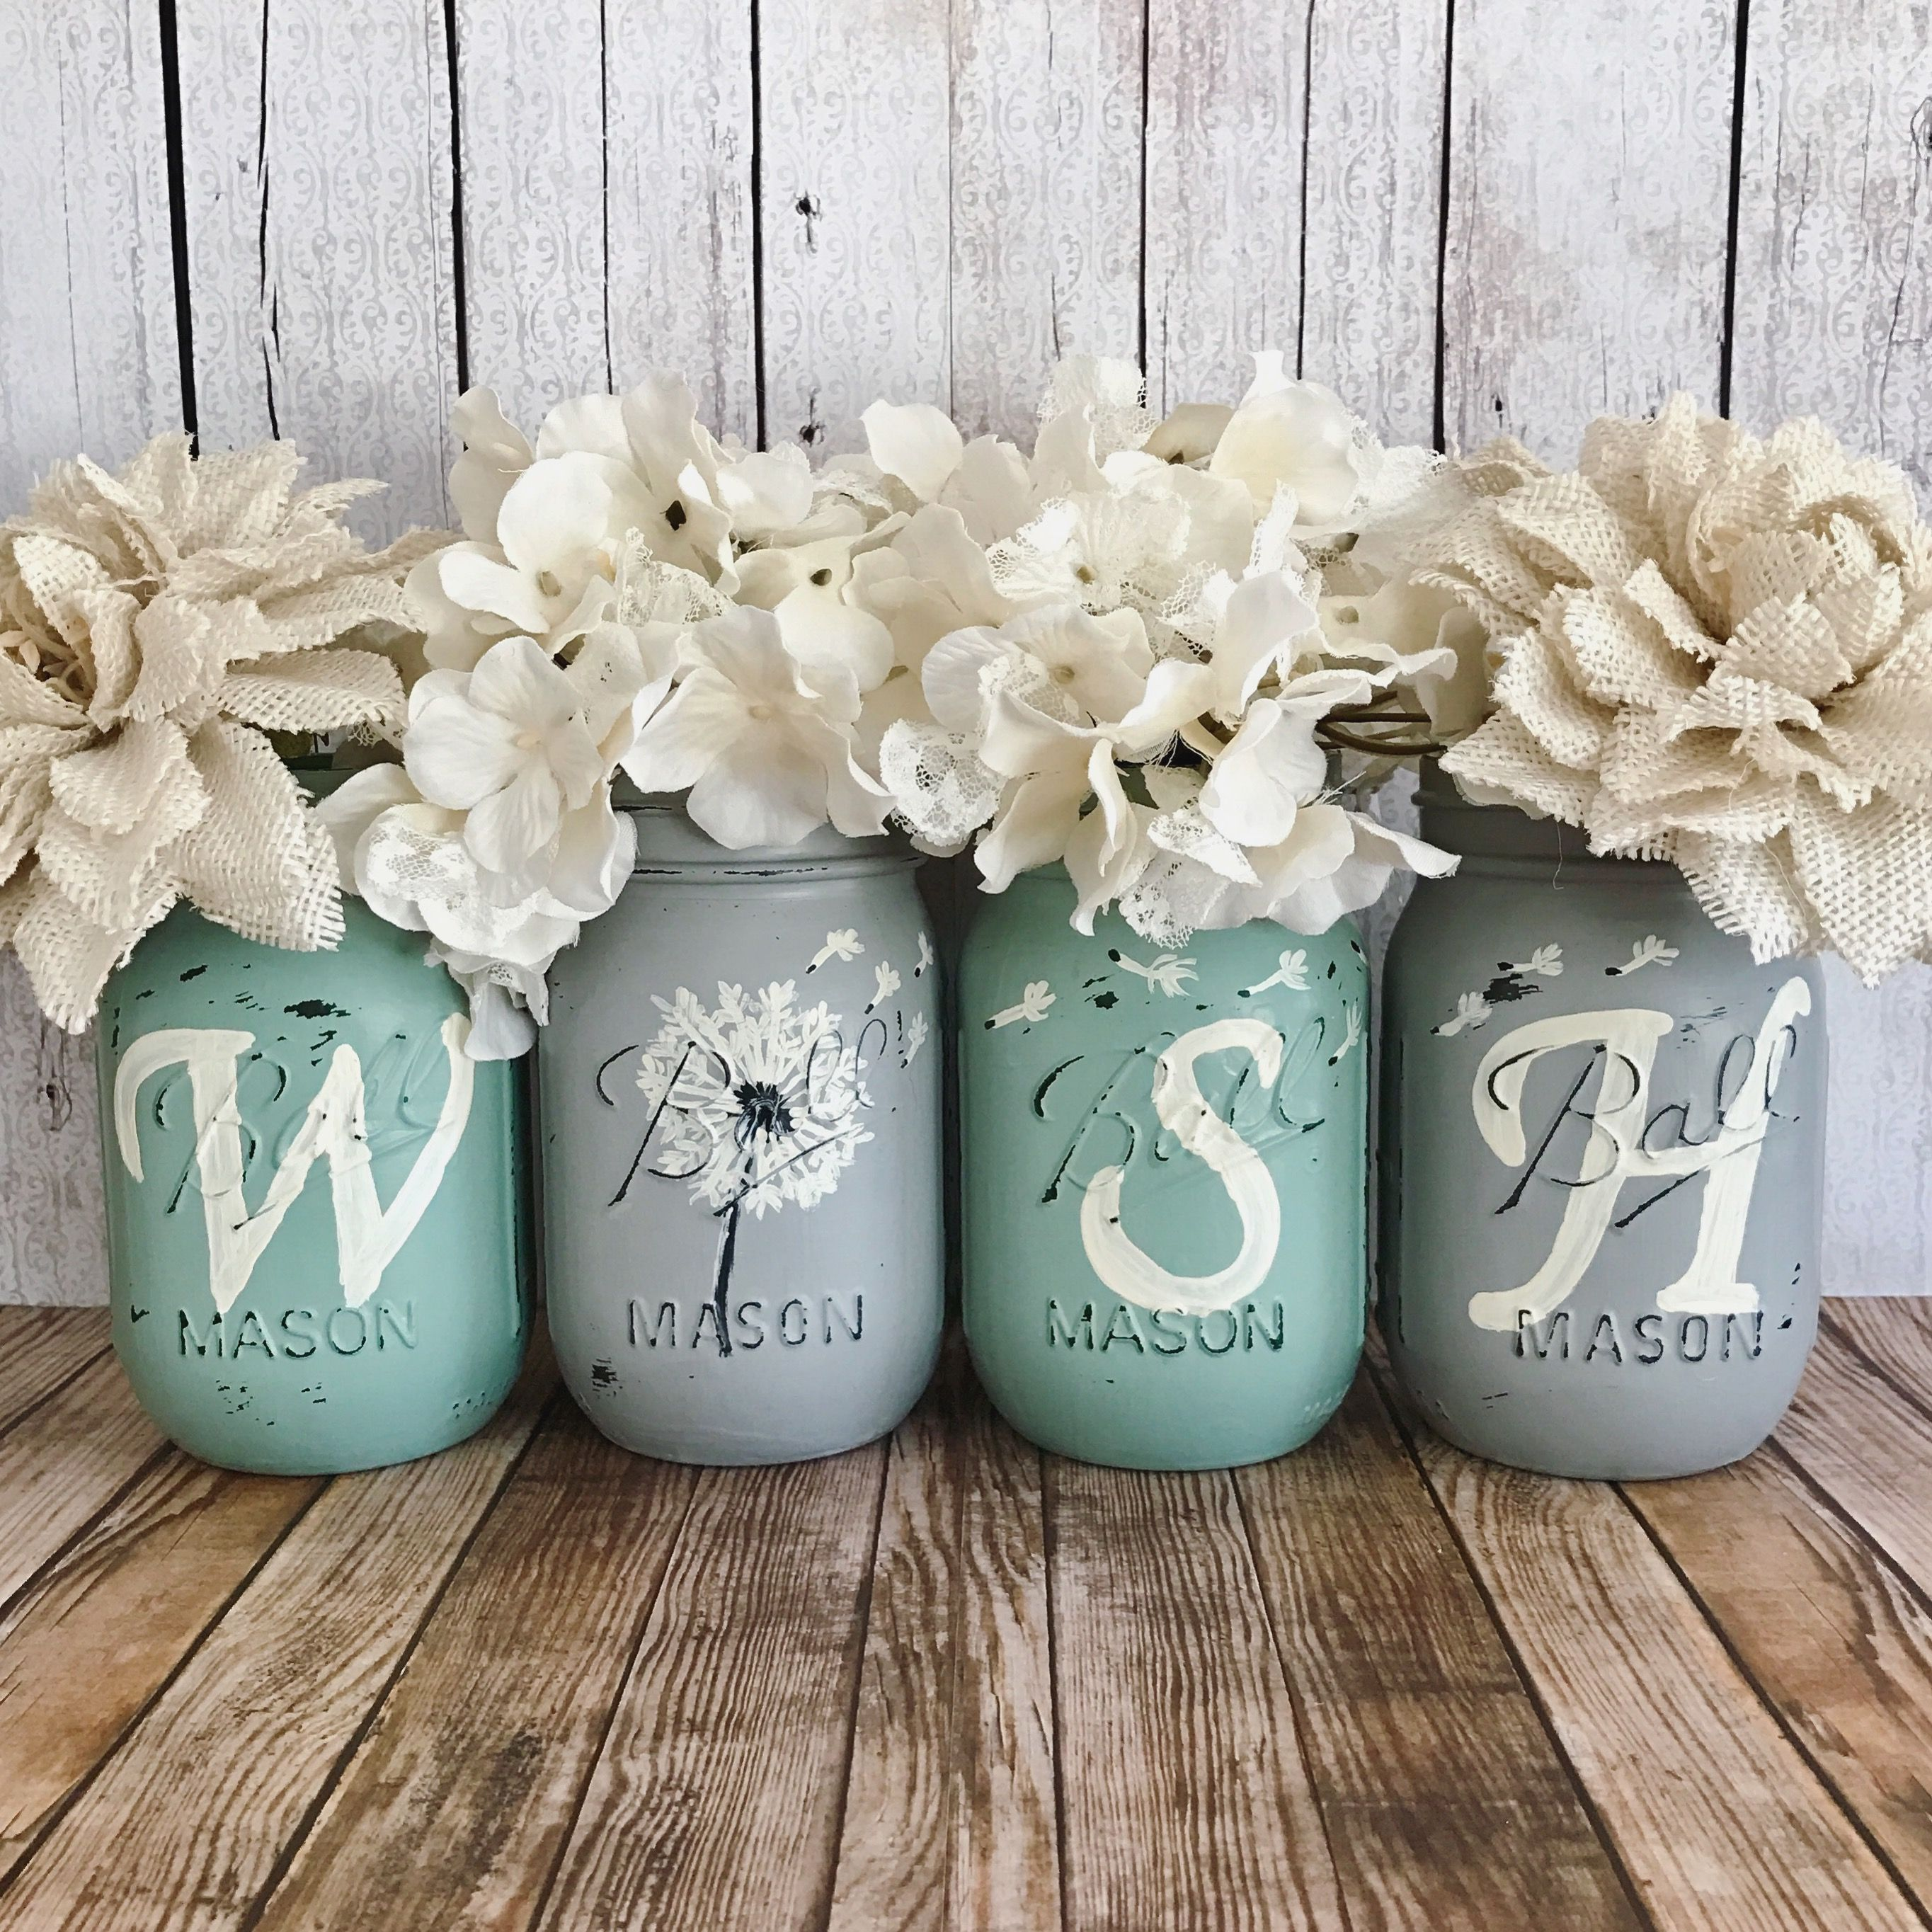 wish mason jars dandelion wishes set of 4 pint size mason jars dandelion wish mason jar set rustic home decor farmhouse decor mint and grey